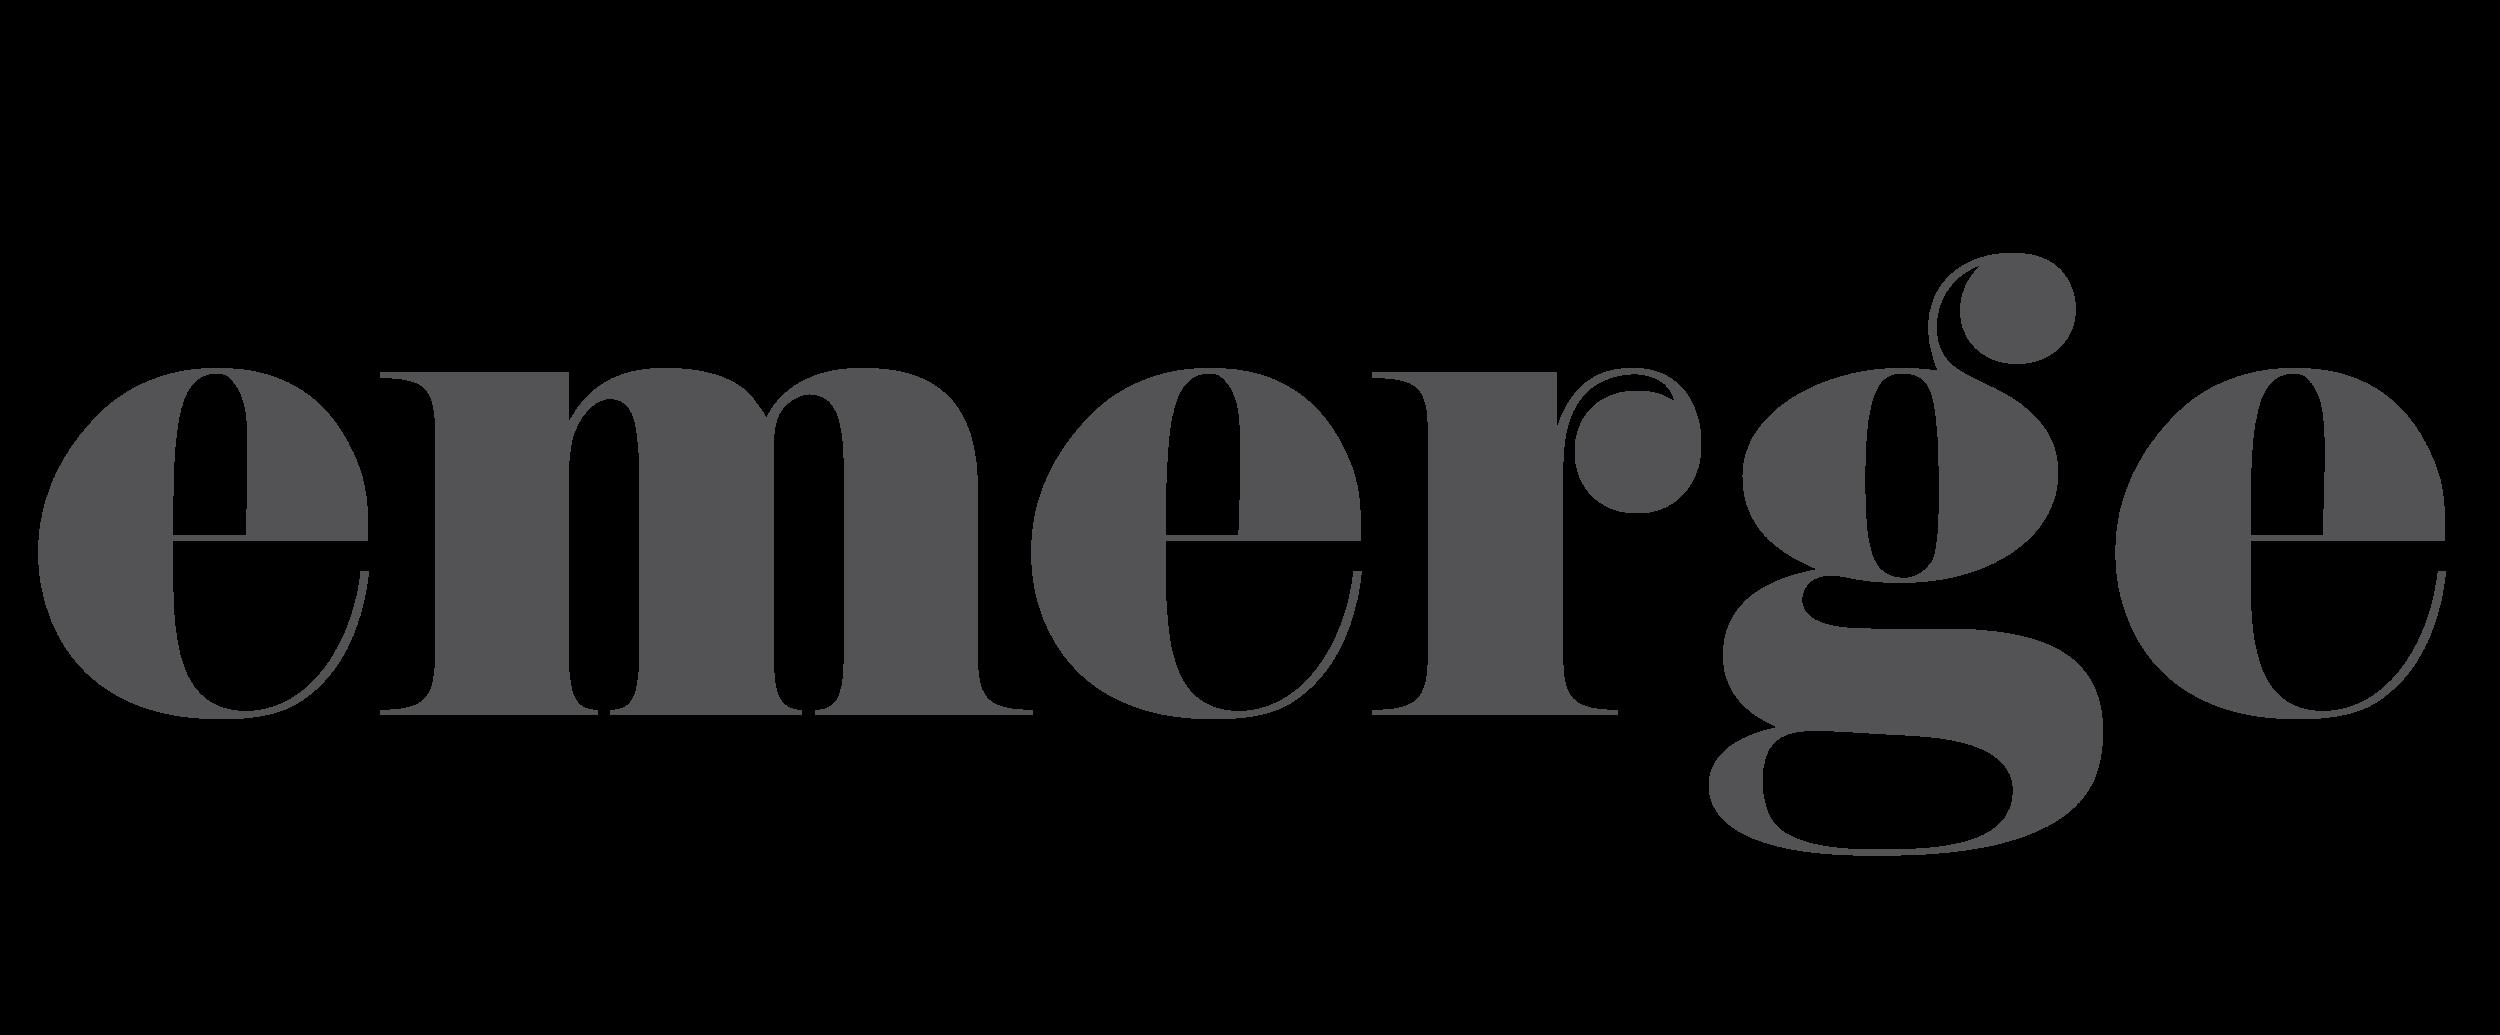 Emerge-logo-flat.png